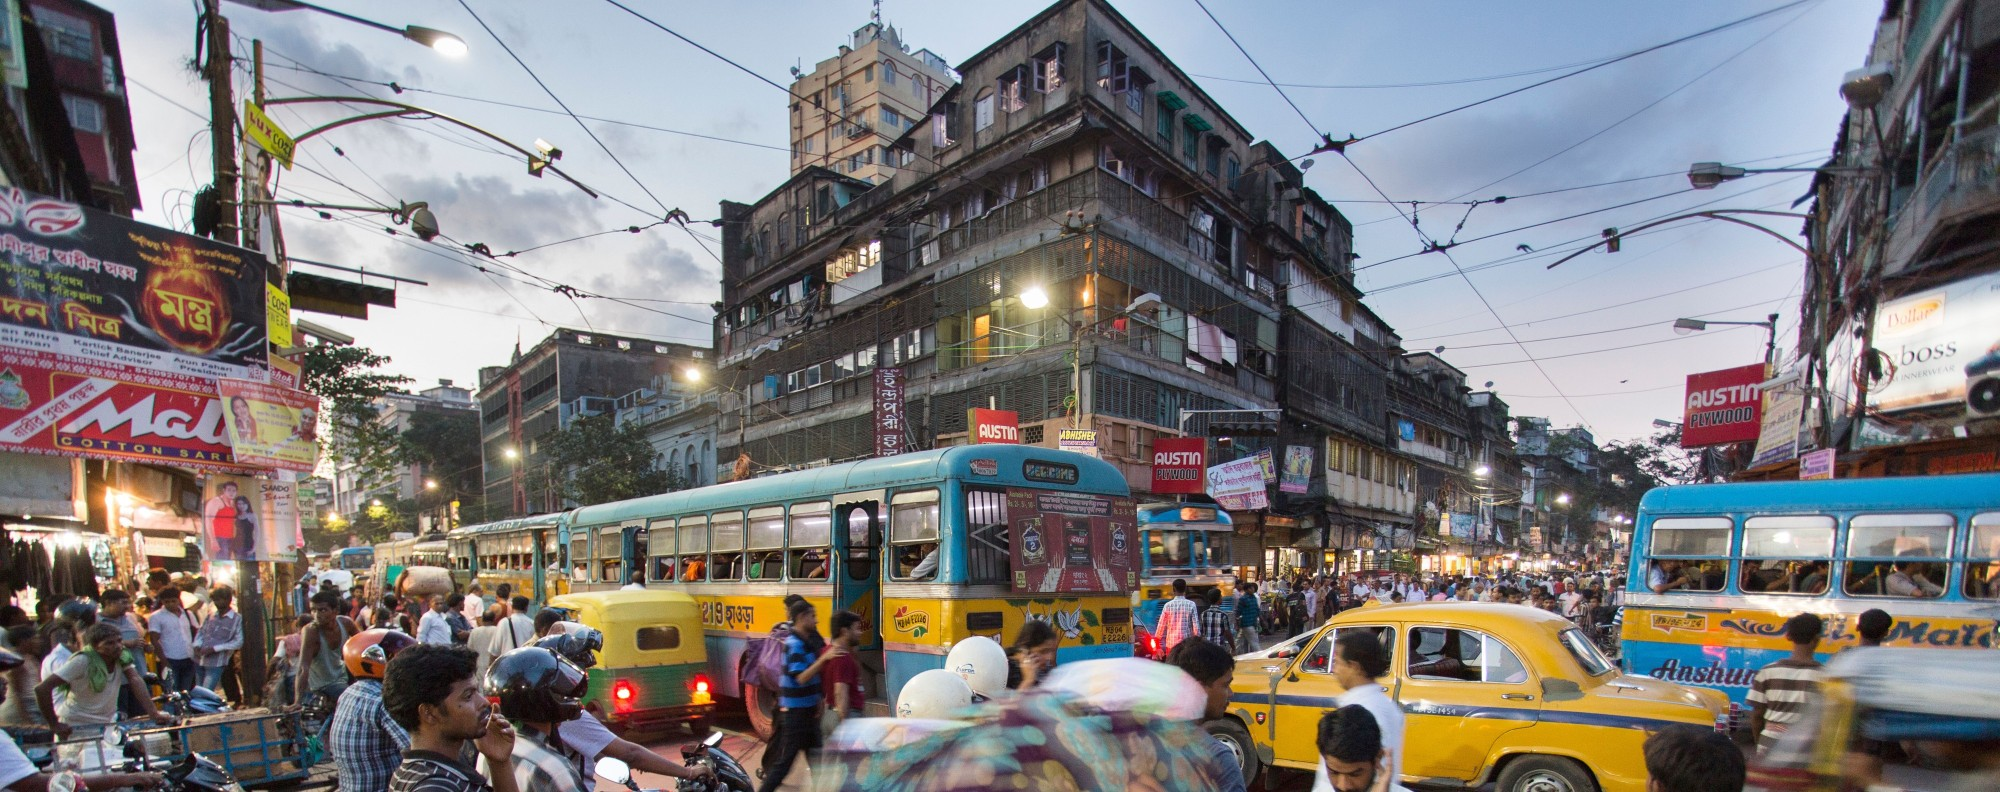 Kolkata traffic. Photo: Alamy Stock Photo